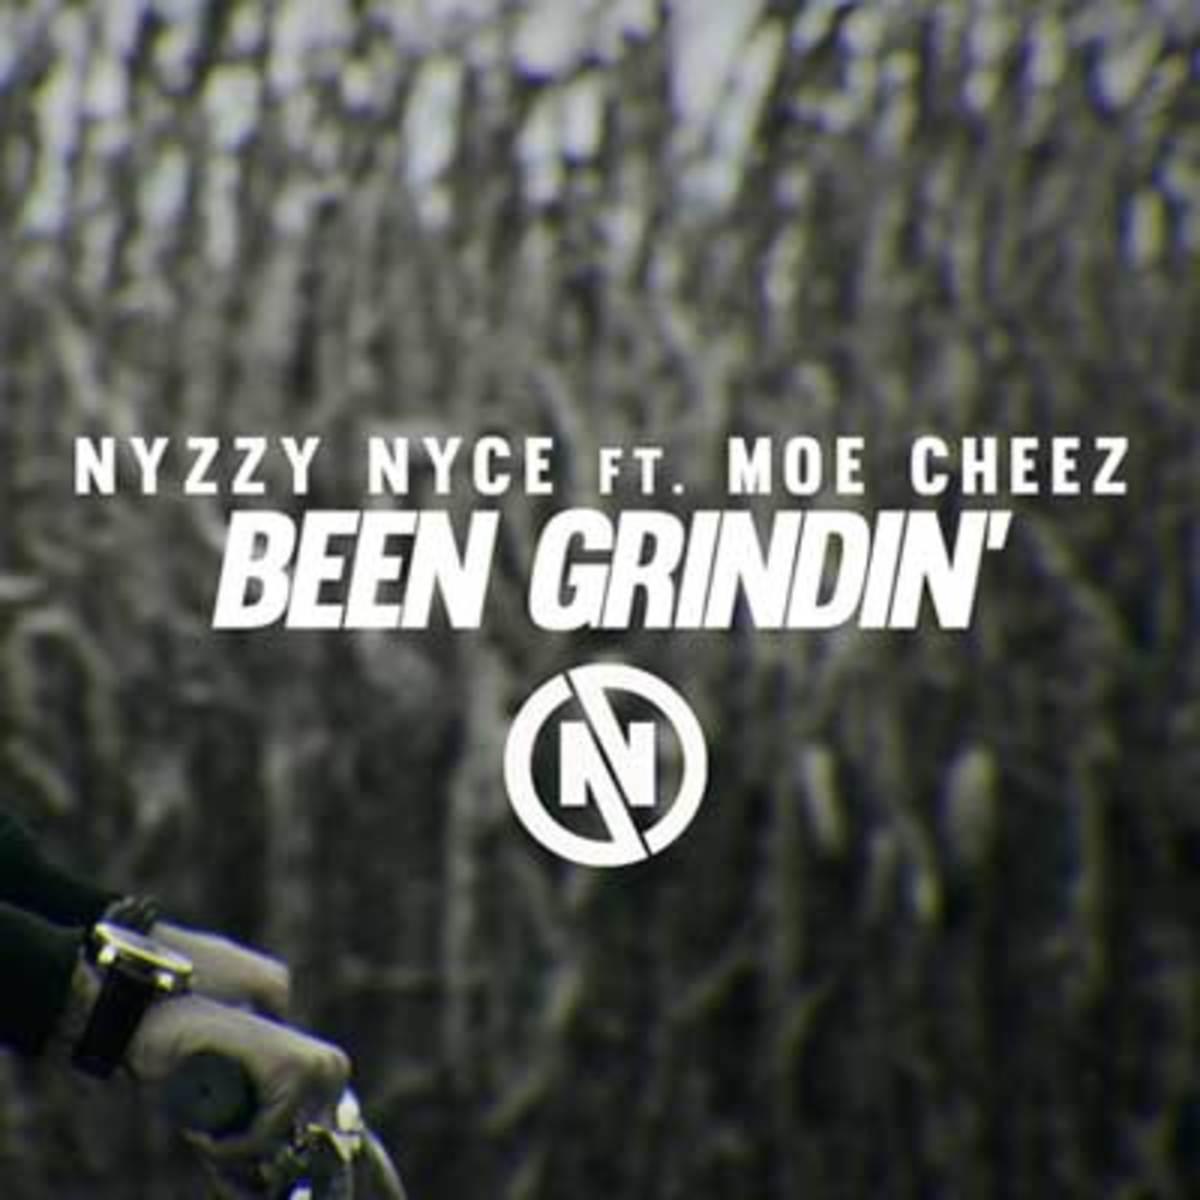 nyzzynyce-beengrindin.jpg